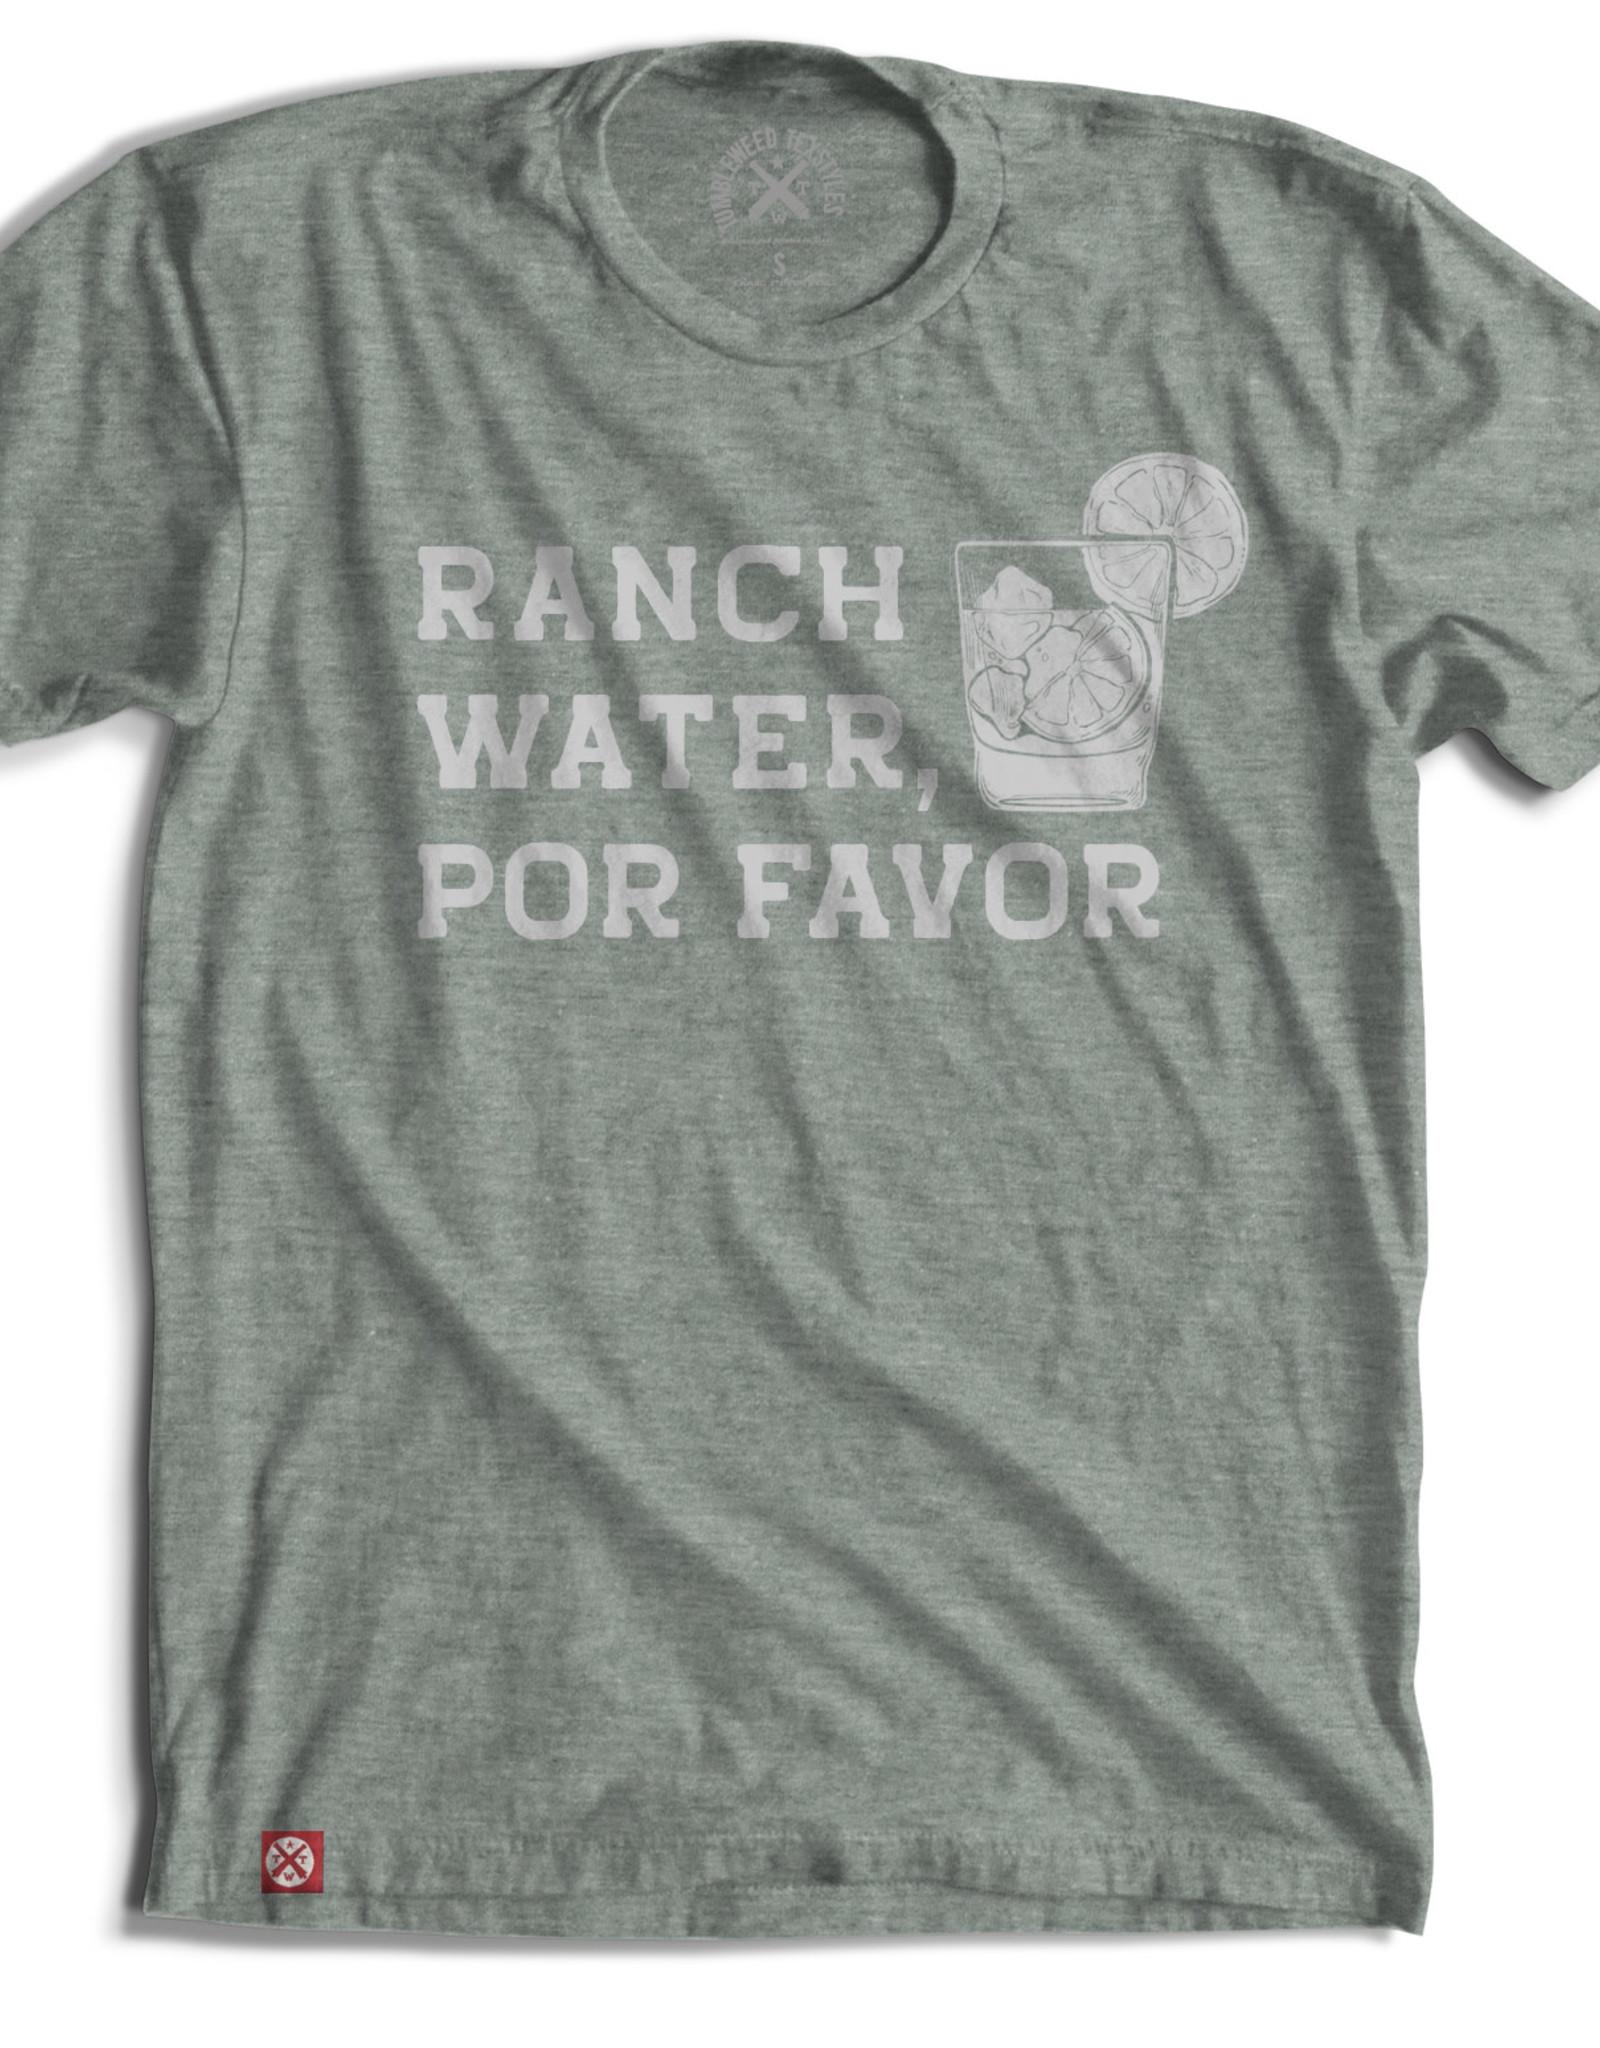 Wink Ranch Water Tee